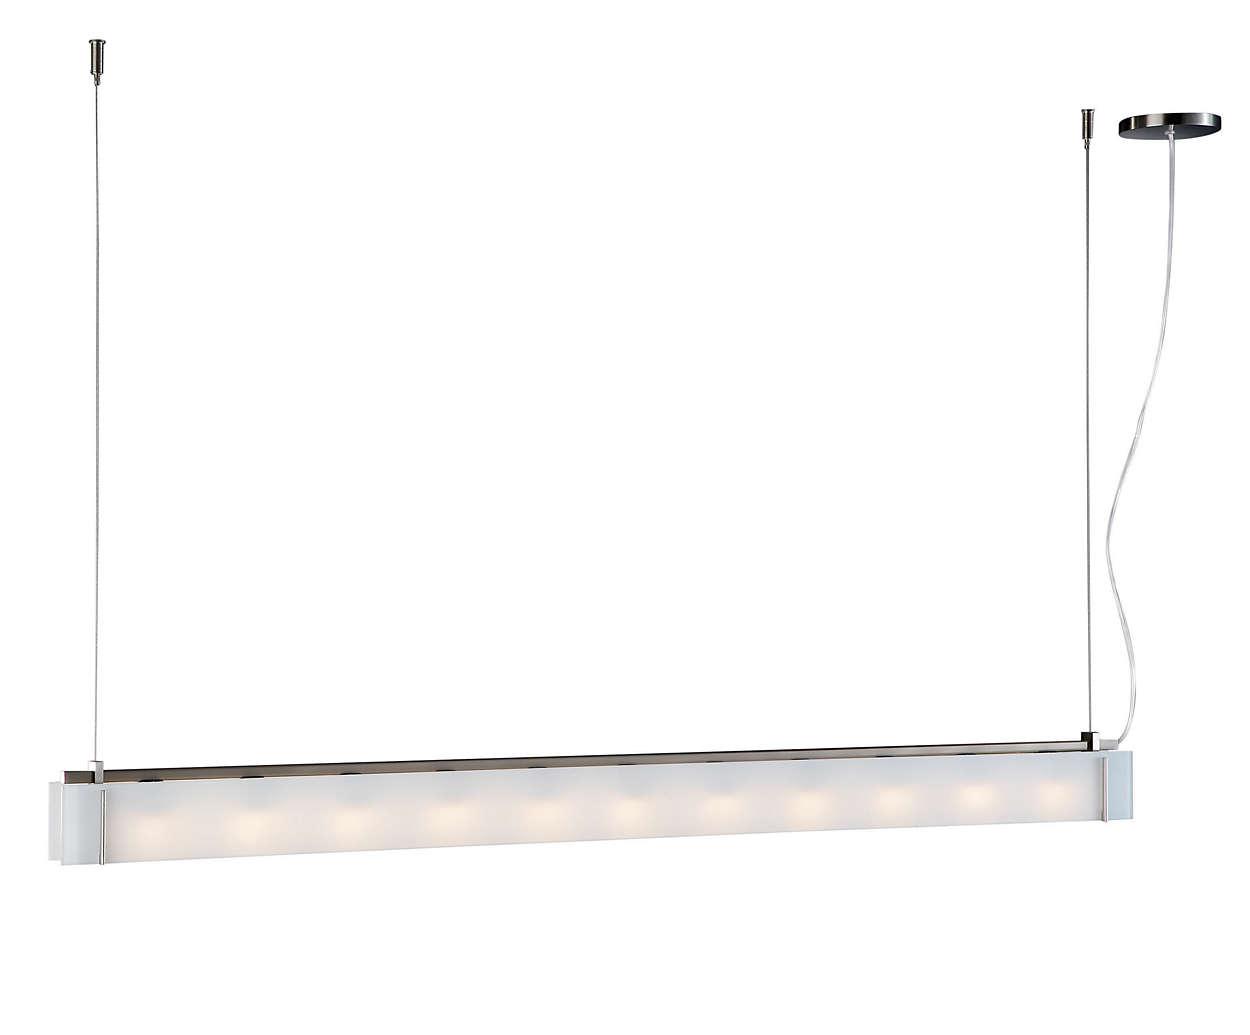 Skab lys, kontroller skyggerne